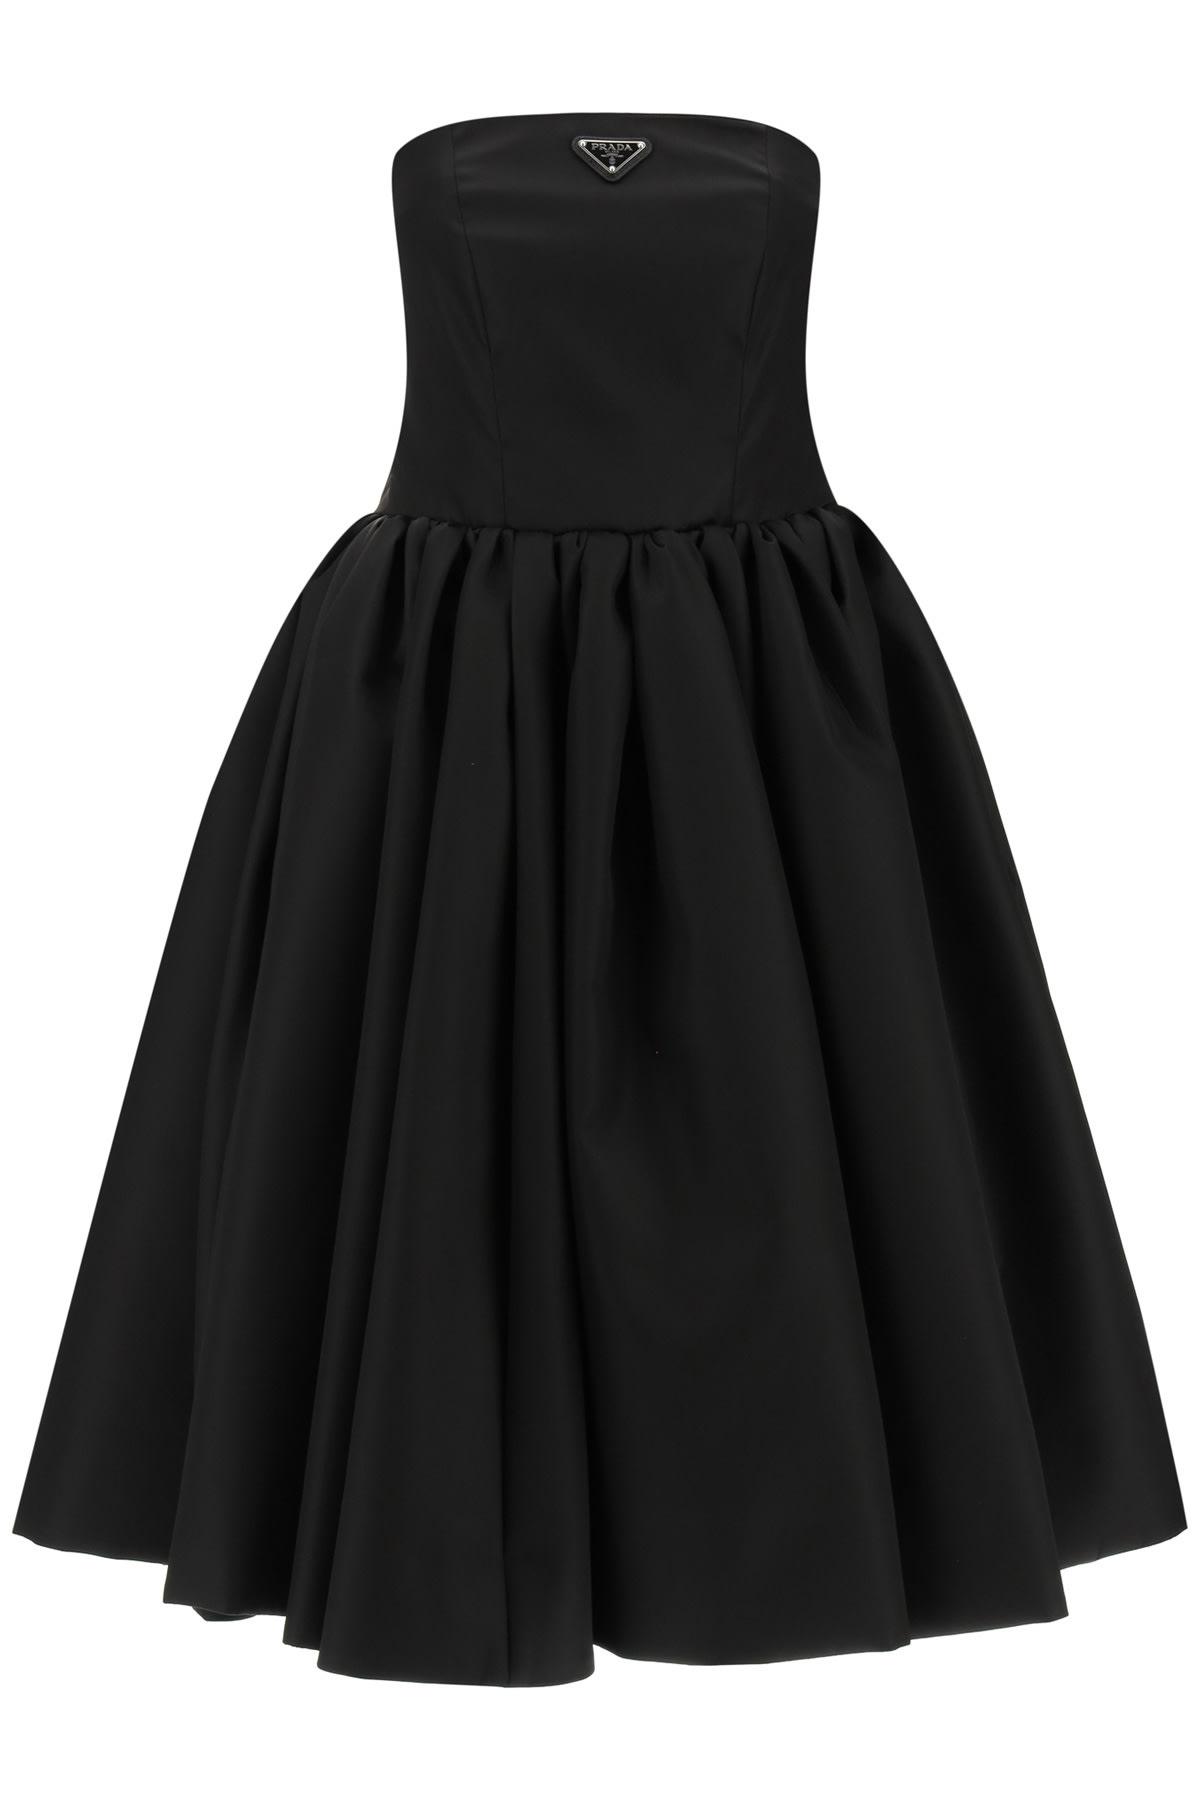 Prada Re-nylon Gabardine Bustier Dress